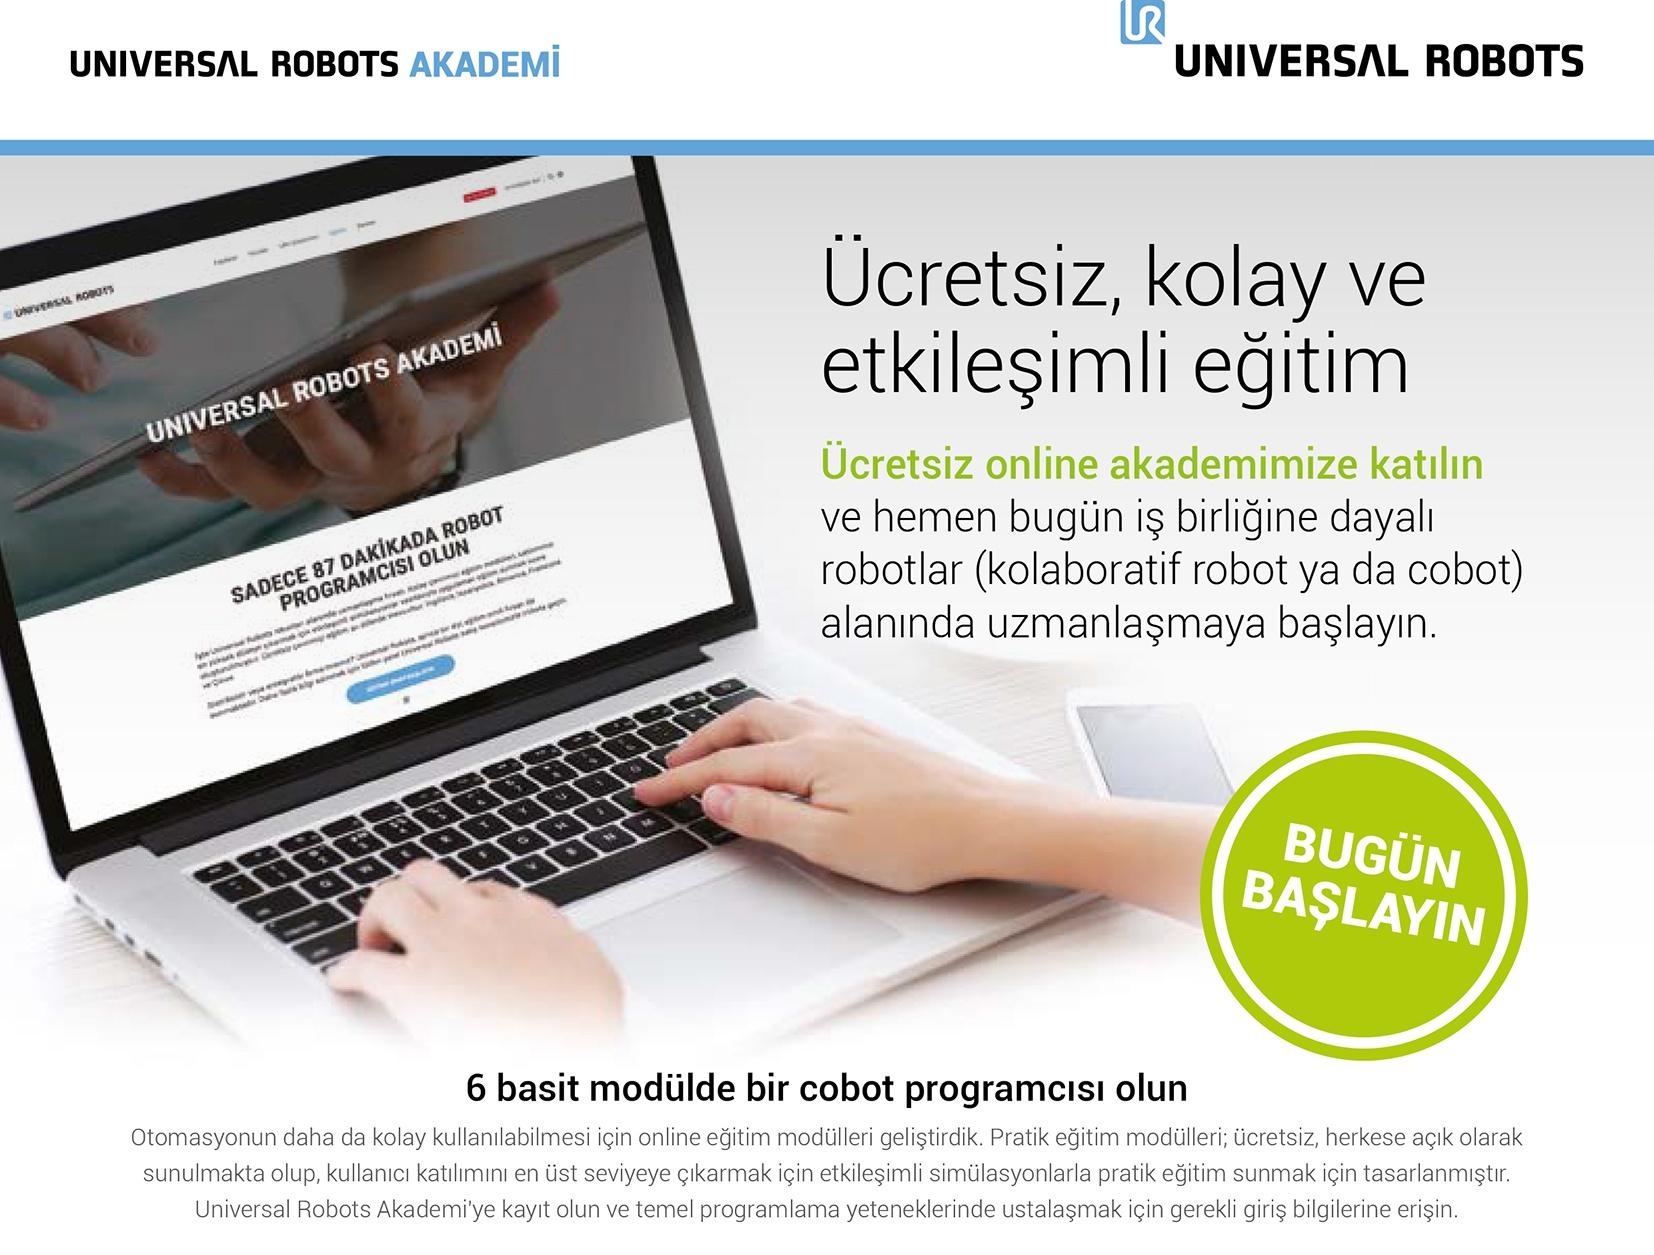 UR Academysheets